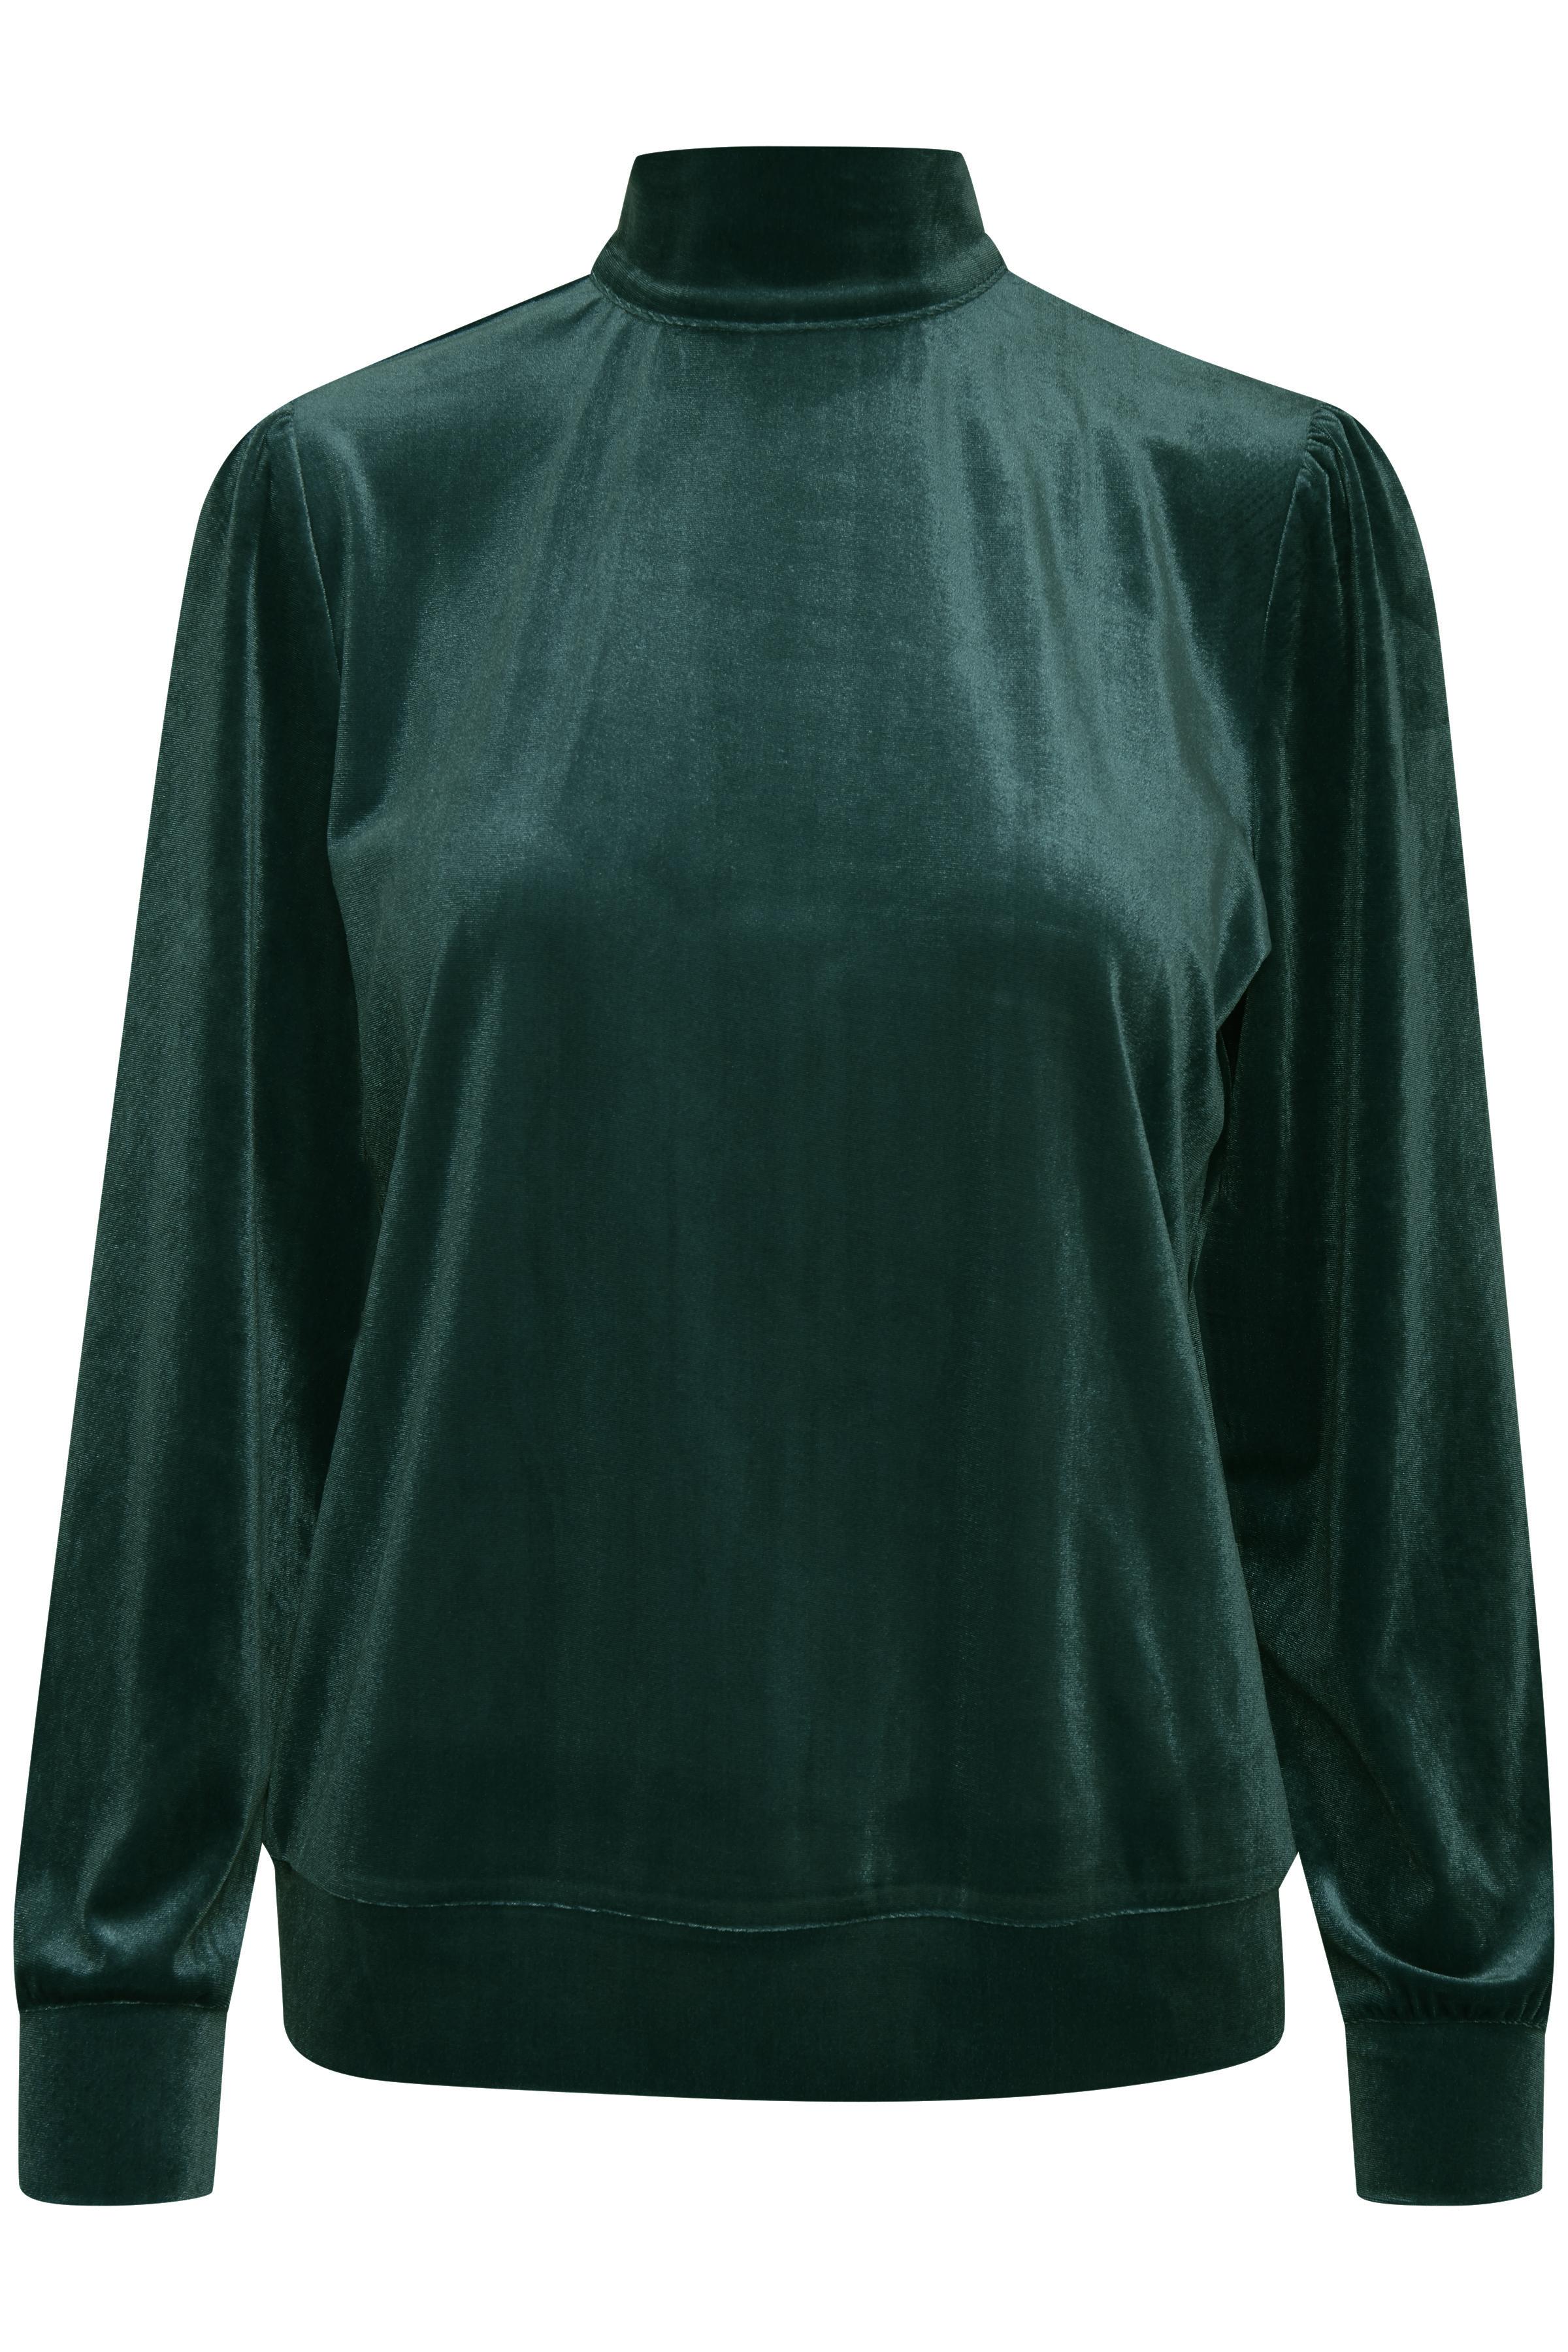 Majestic Green Stickad pullover från b.young – Köp Majestic Green Stickad pullover från storlek XS-XL här